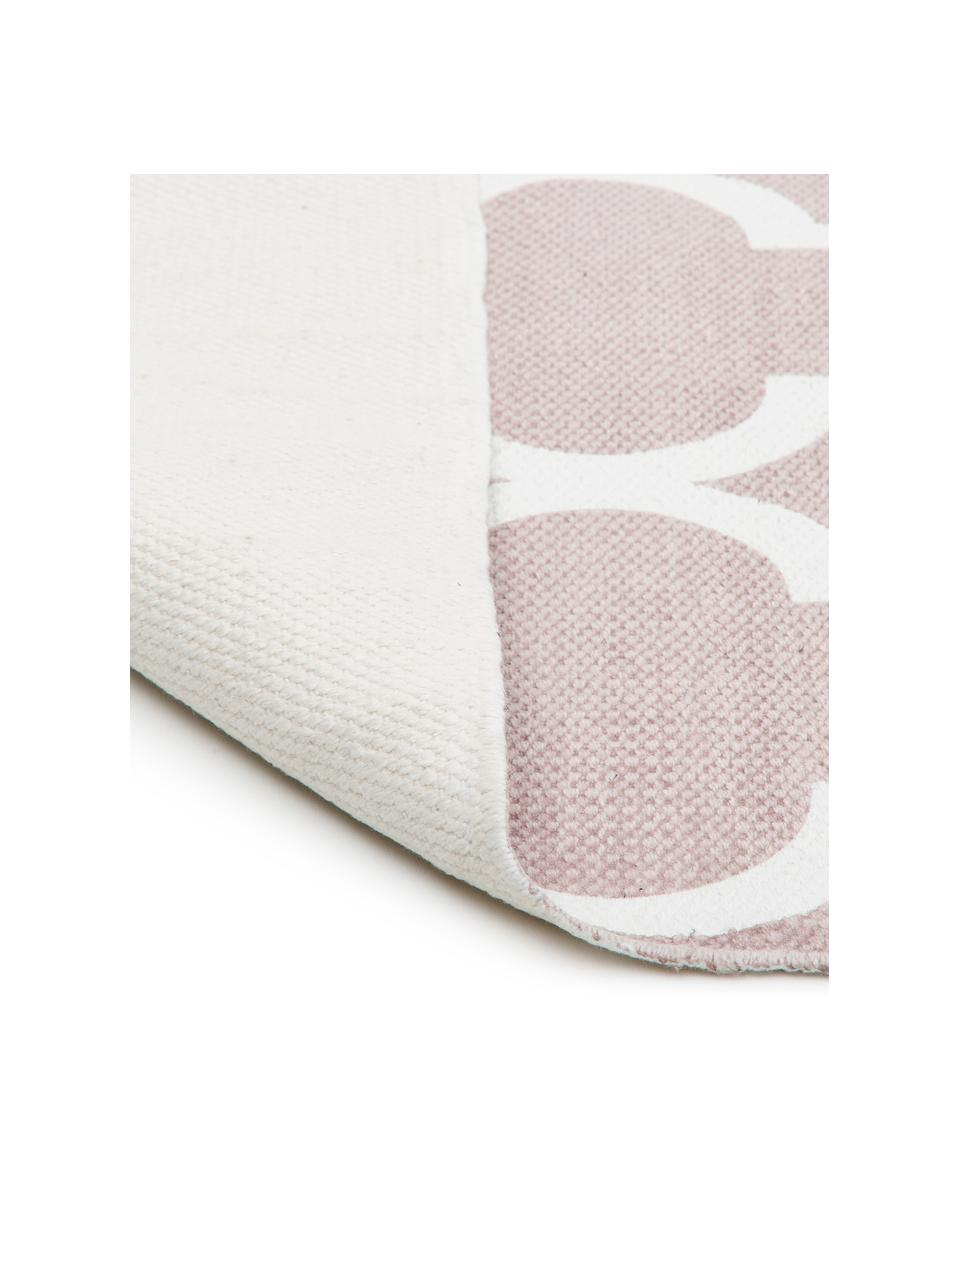 Tapis en coton fin tissé main rose Amira, Rose, blanc crème